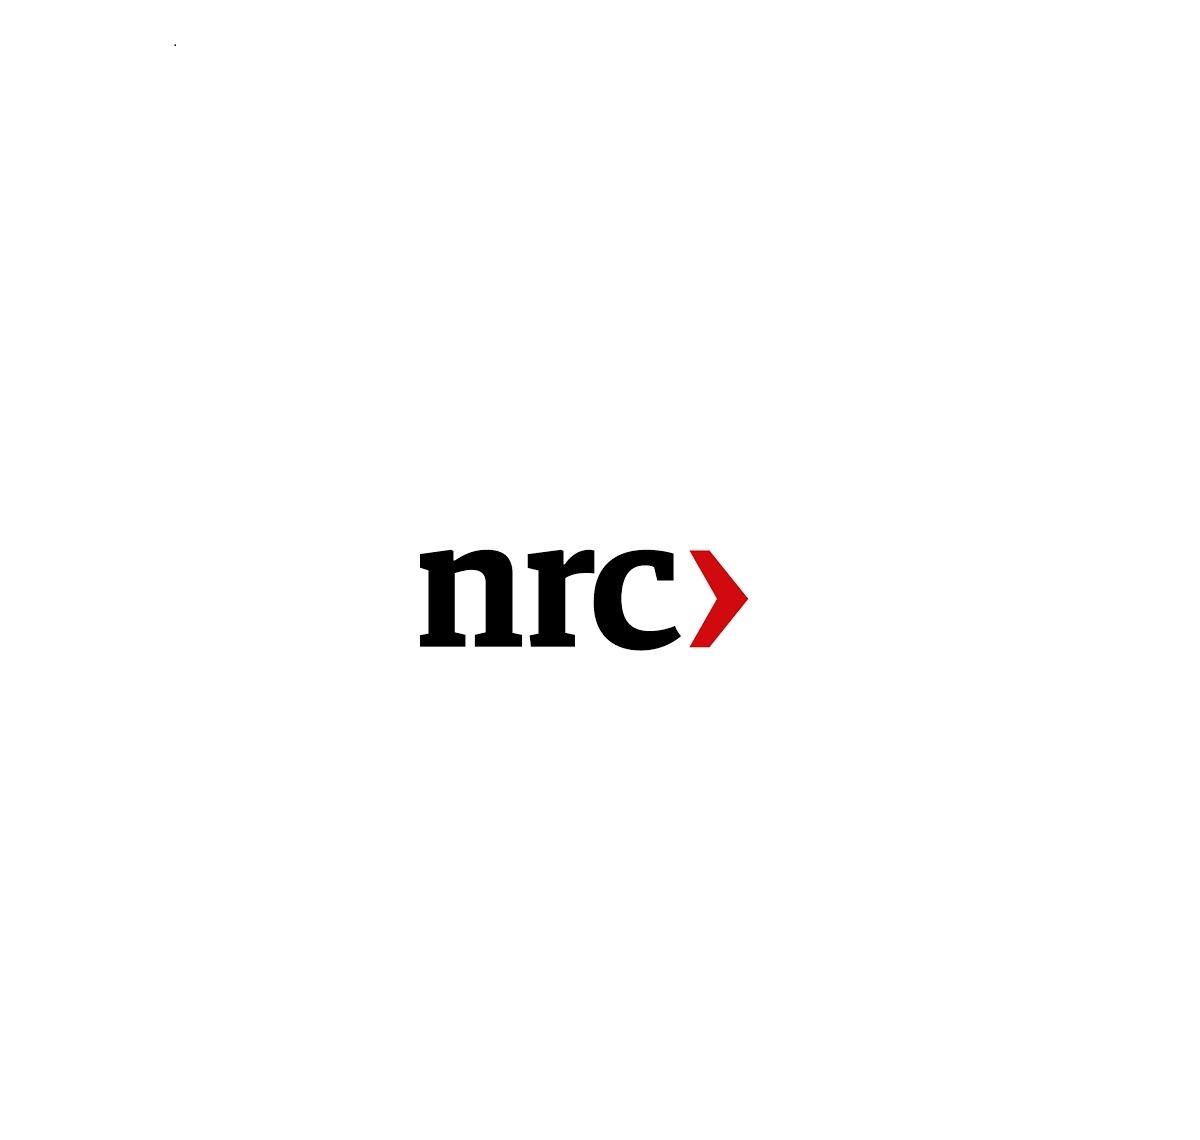 NRC: Nederlanders ervaren steeds meer werkdruk